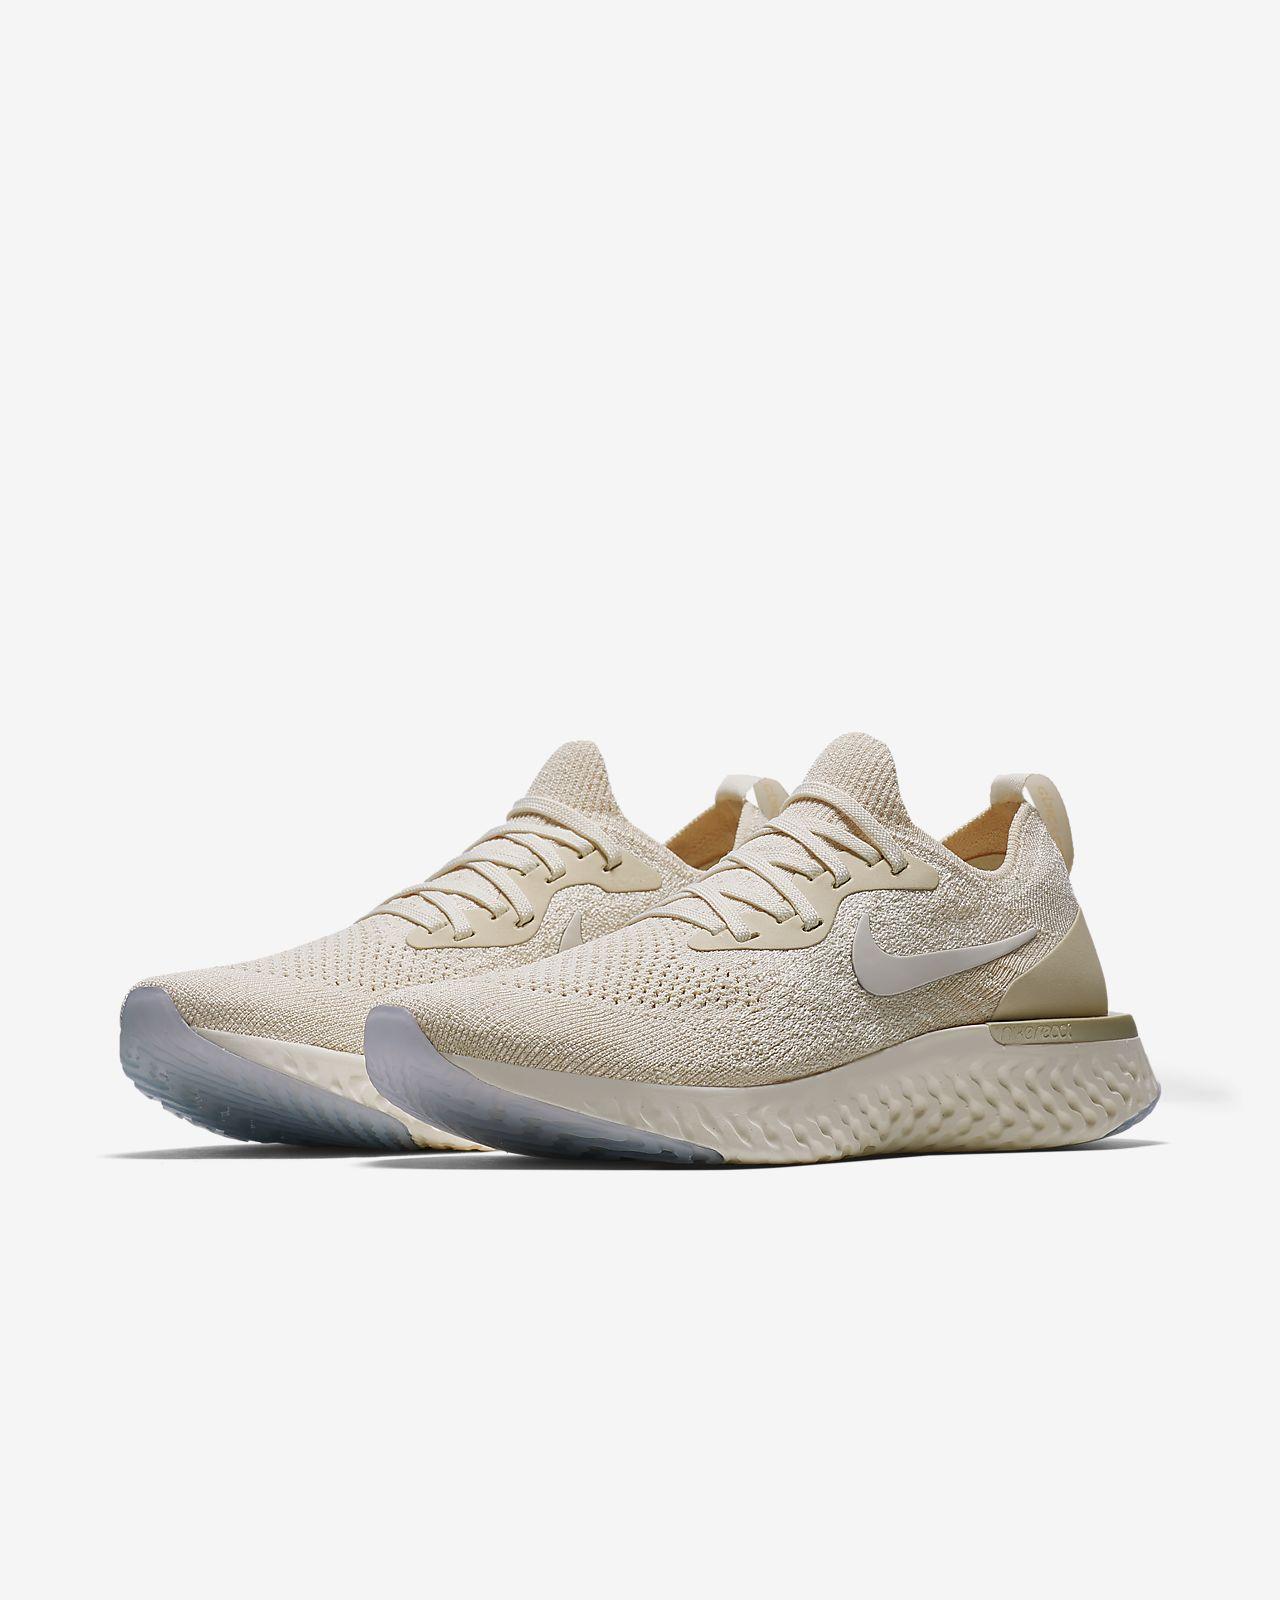 Women's Nike Epic React Flyknit Grey Running training shoes Sizes 6-11